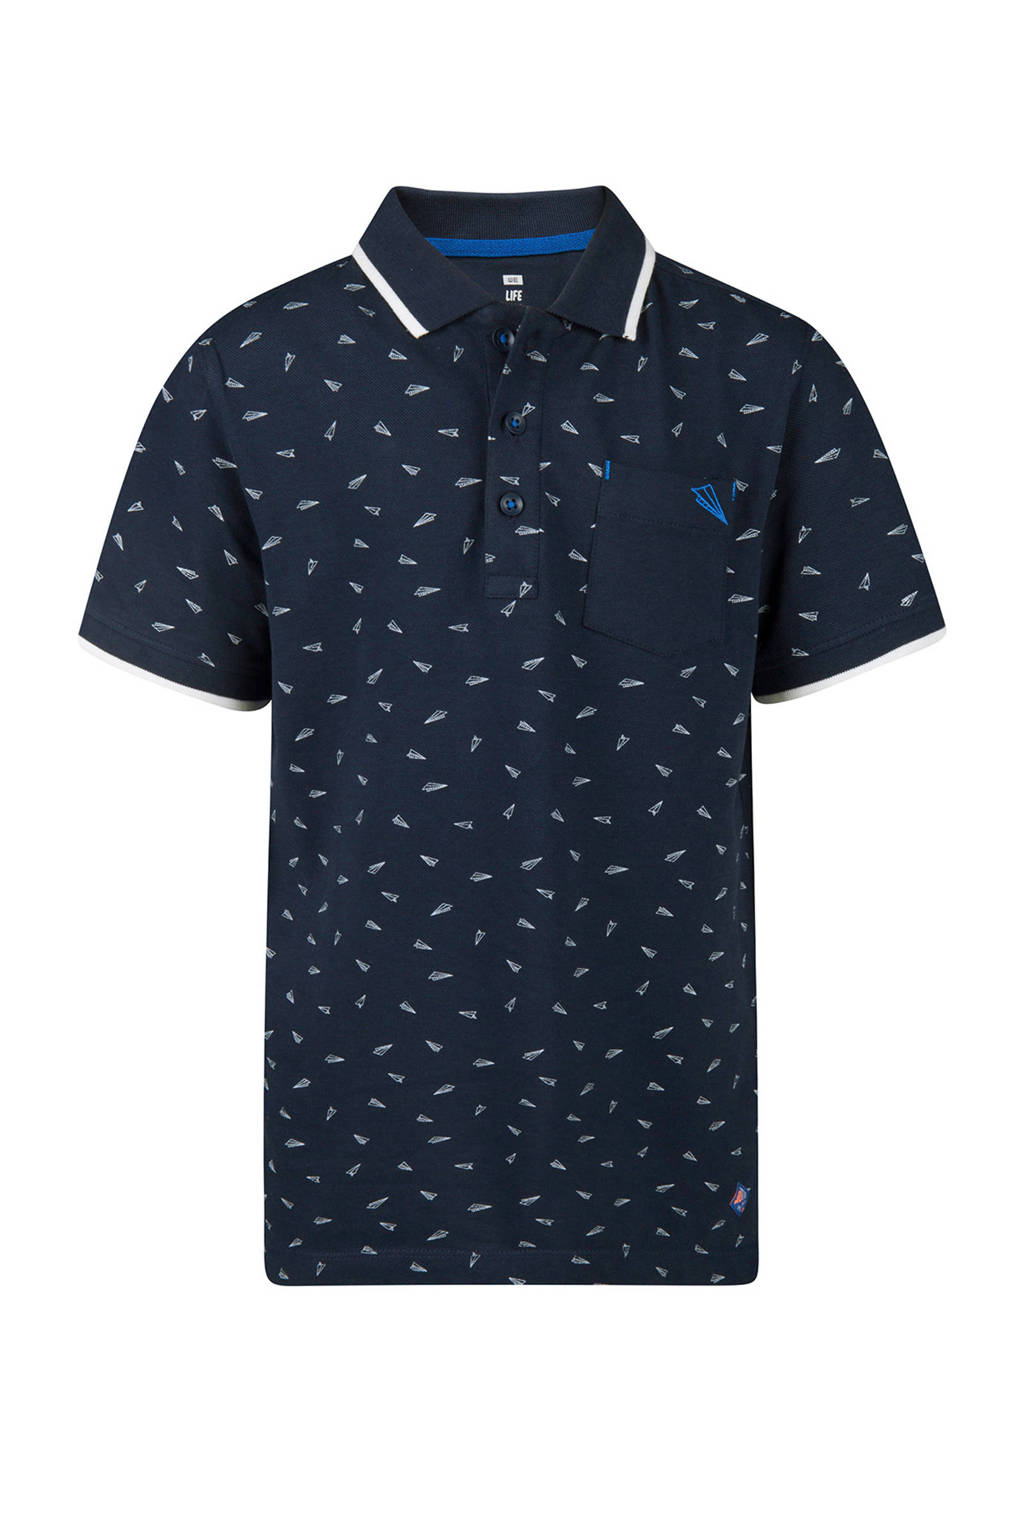 WE Fashion katoenen polo all over print blauw, Marine